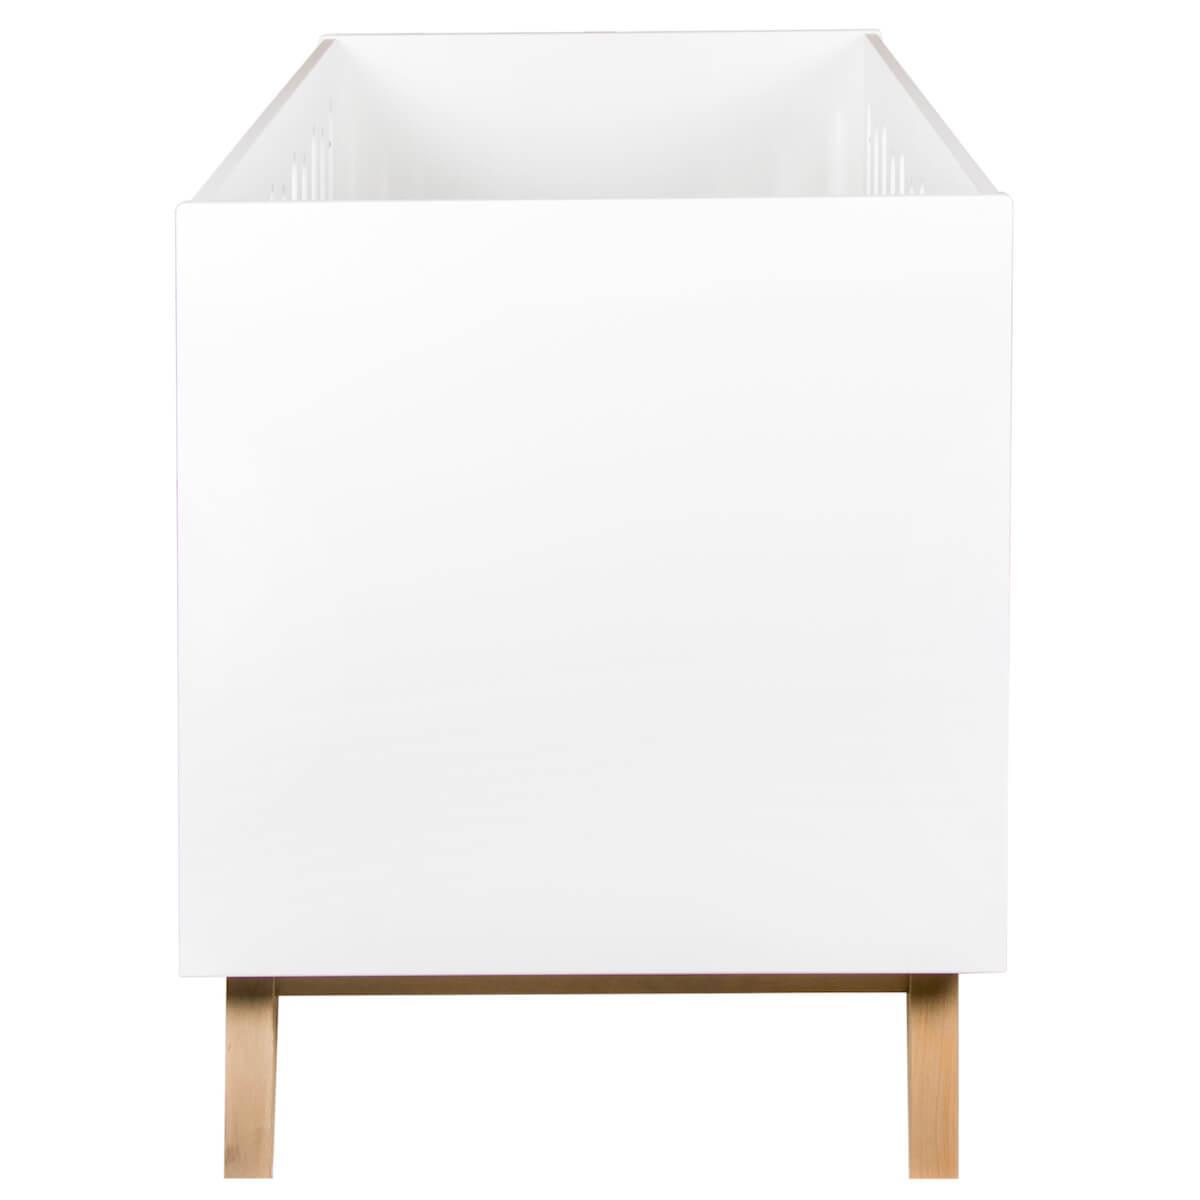 Cuna evolutiva 70x140cm TRENDY Quax blanco